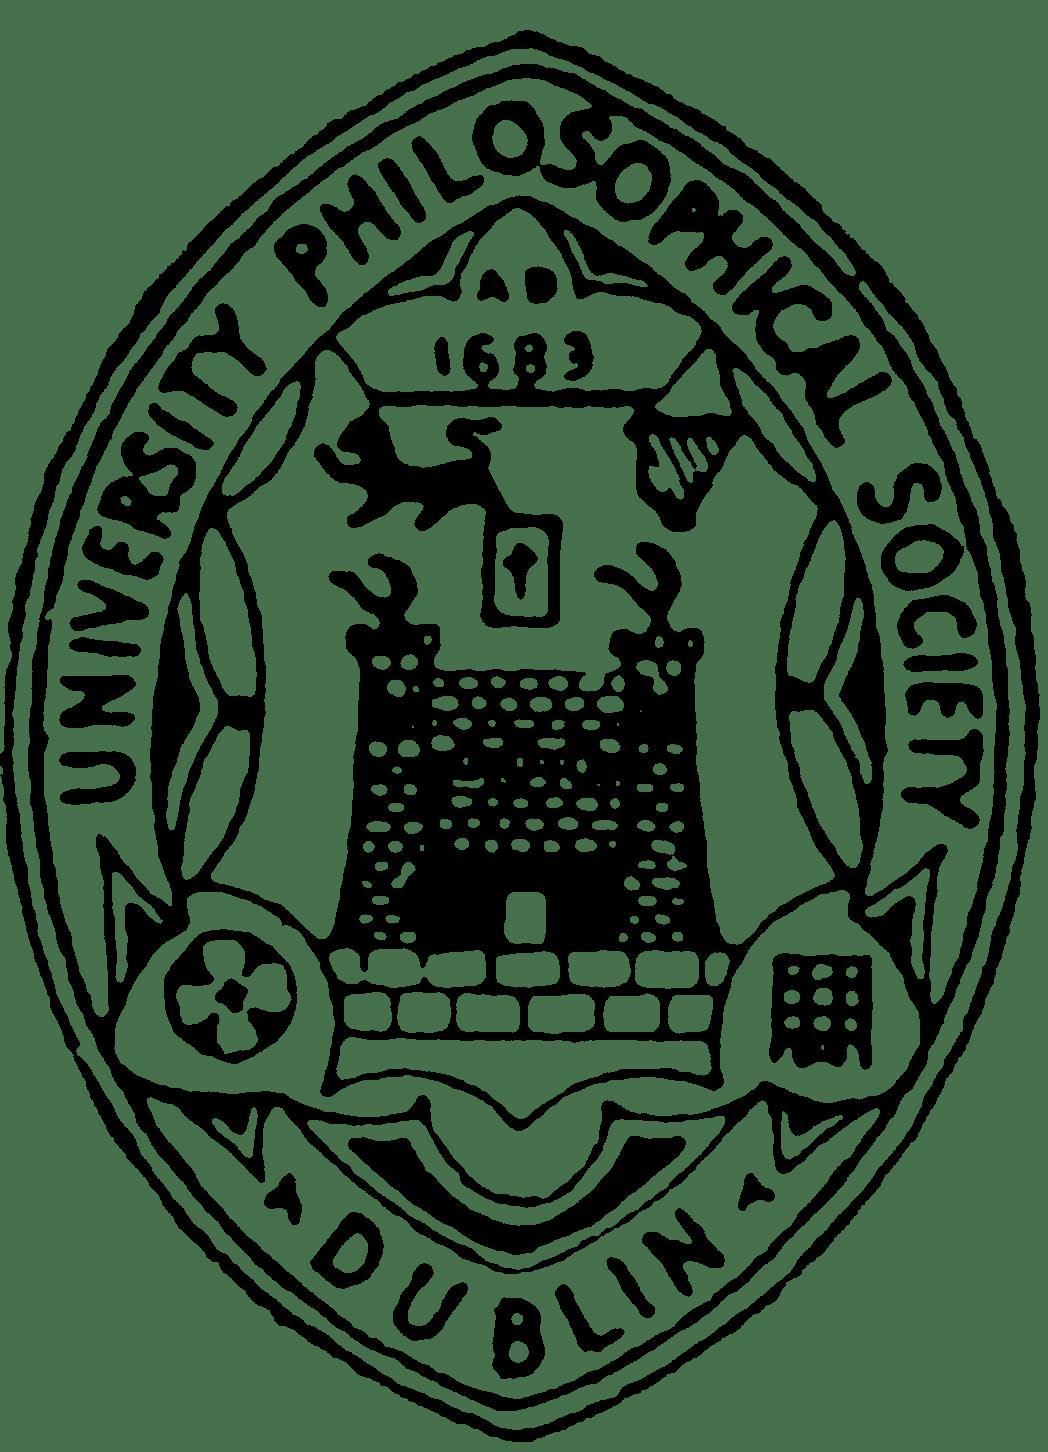 University Philosophical Society